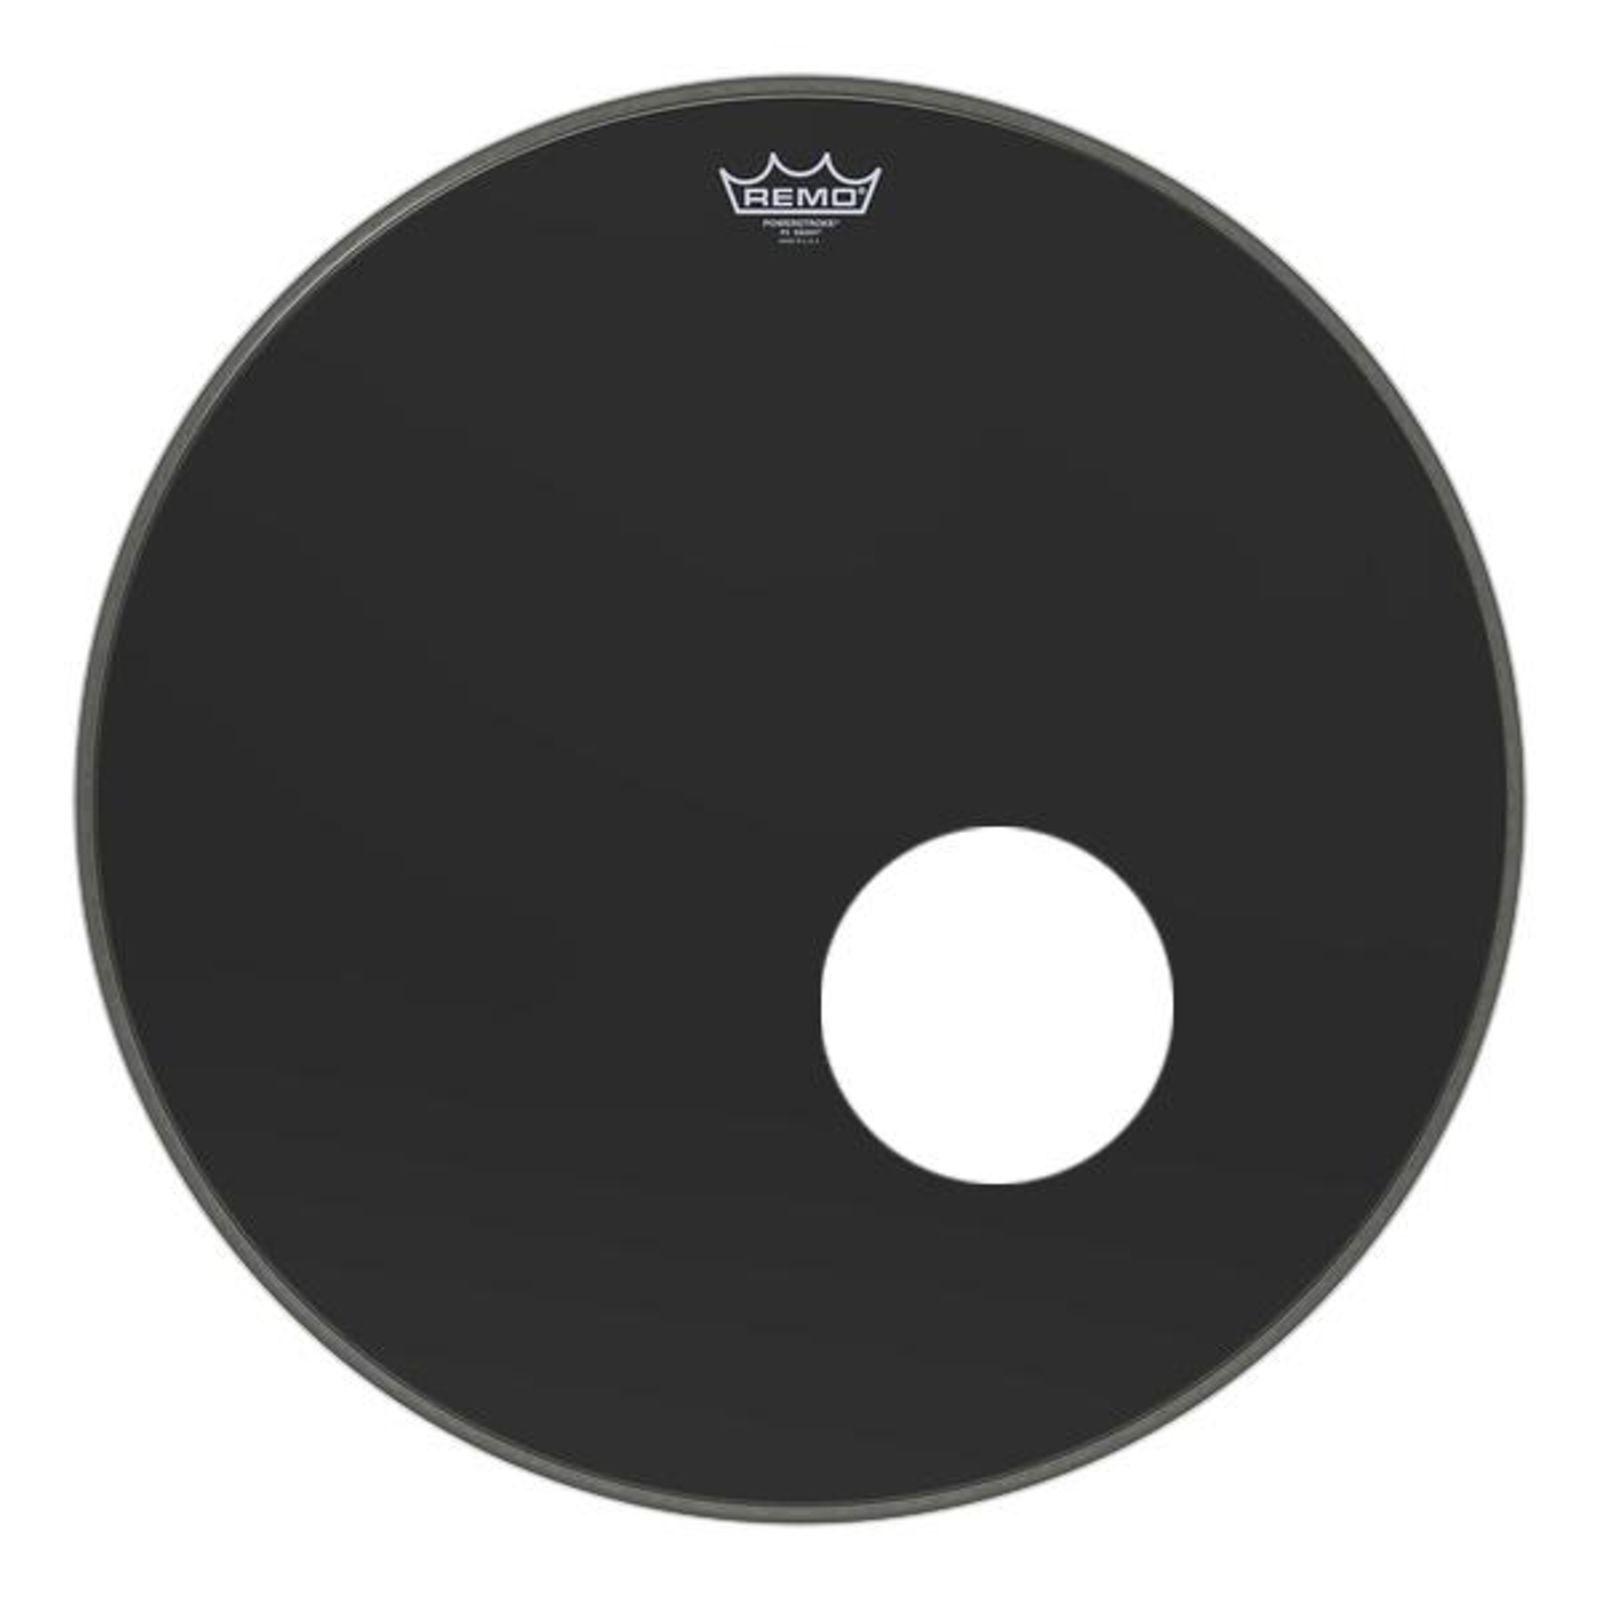 Schwarzes REMO 22  Powerstroke P3 Ebony Bass Drum Fell mit 5  Loch & Dynamo Ring